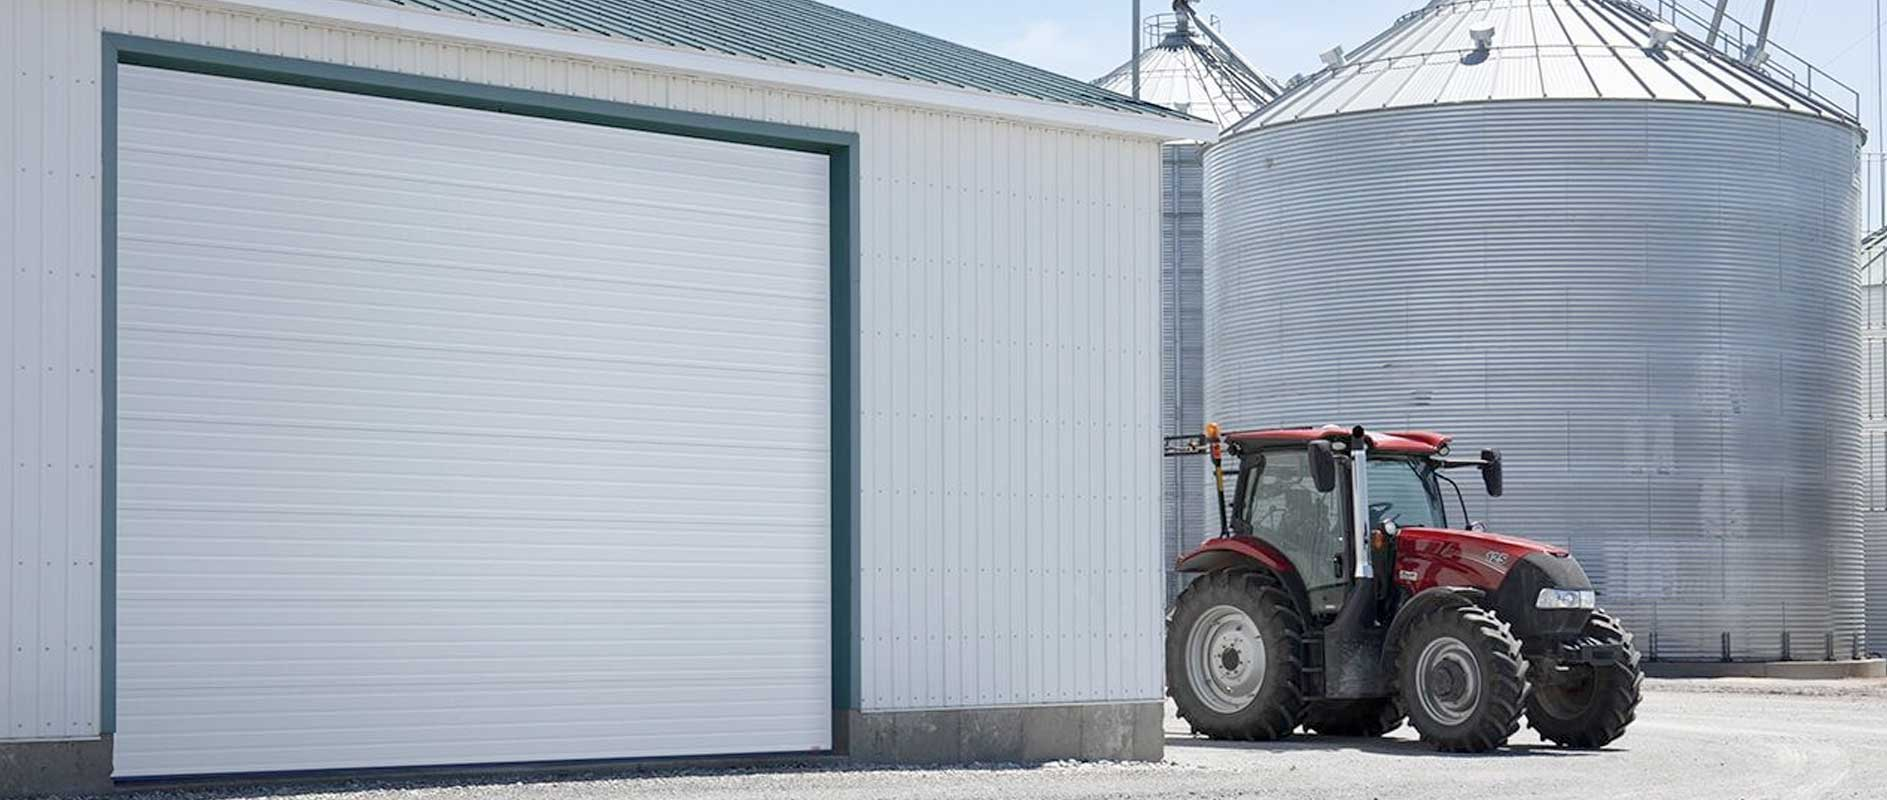 Premium Quality Rolling & Sectional Overhead Doors